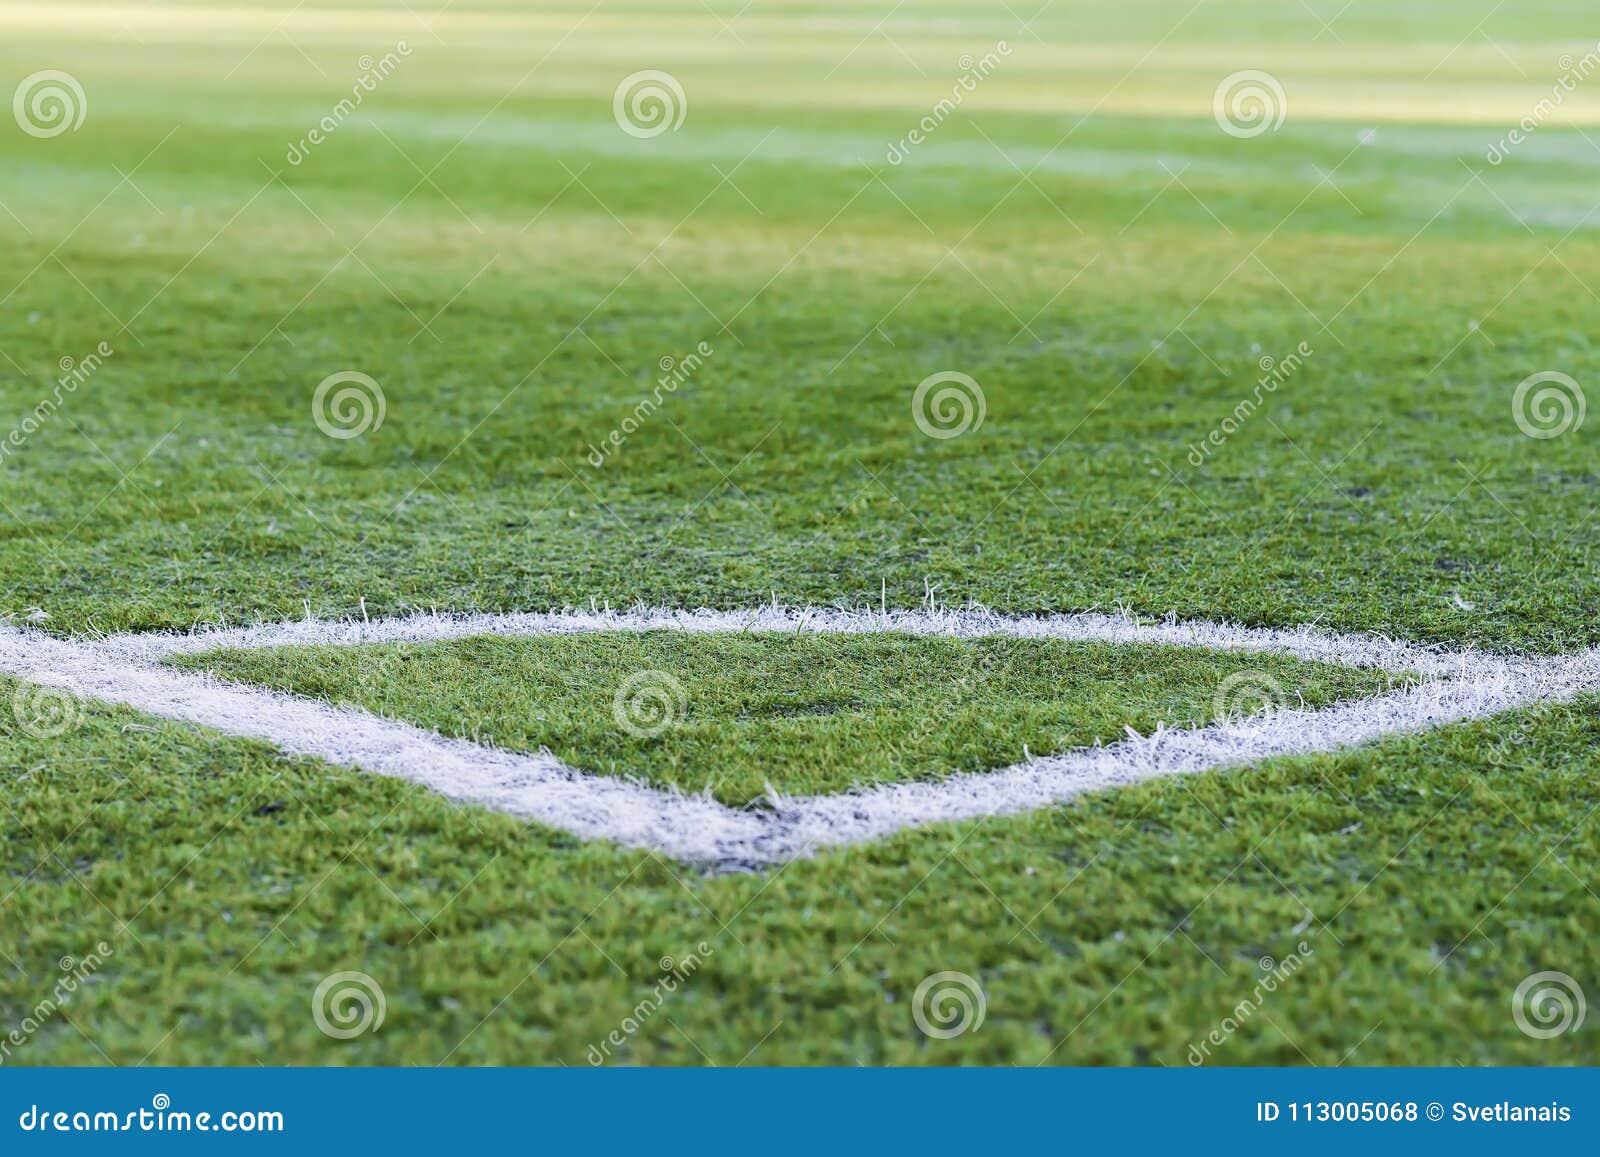 green grass football field. Corner Of Soccer Field, Pattern Green Grass For Football Sport, Football, Sport Texture, Selective Focus Stock Photo - Image Backdrop, Grid: 113005068 Field